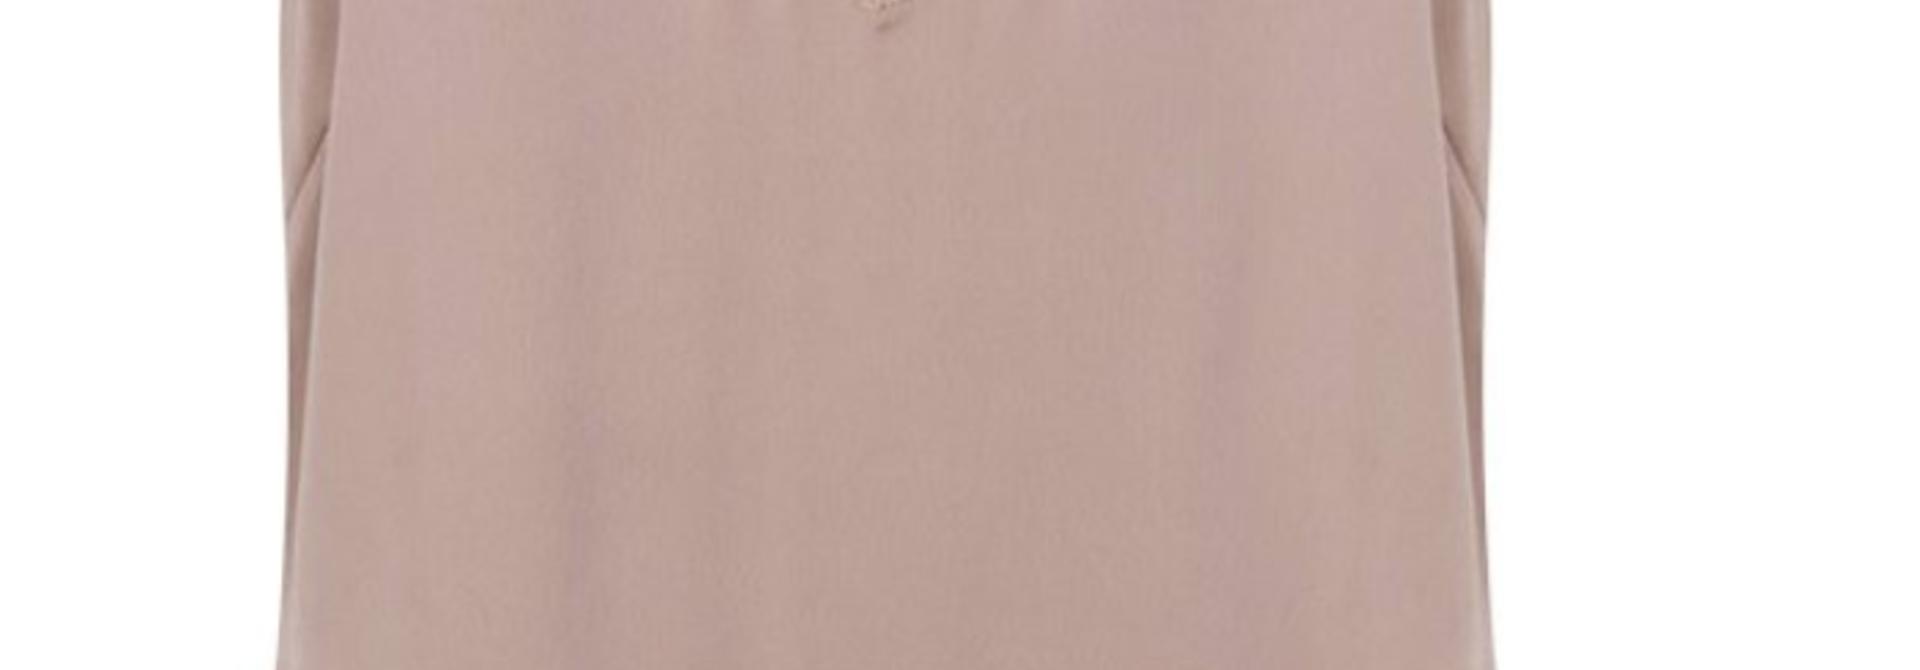 Moanna camisole